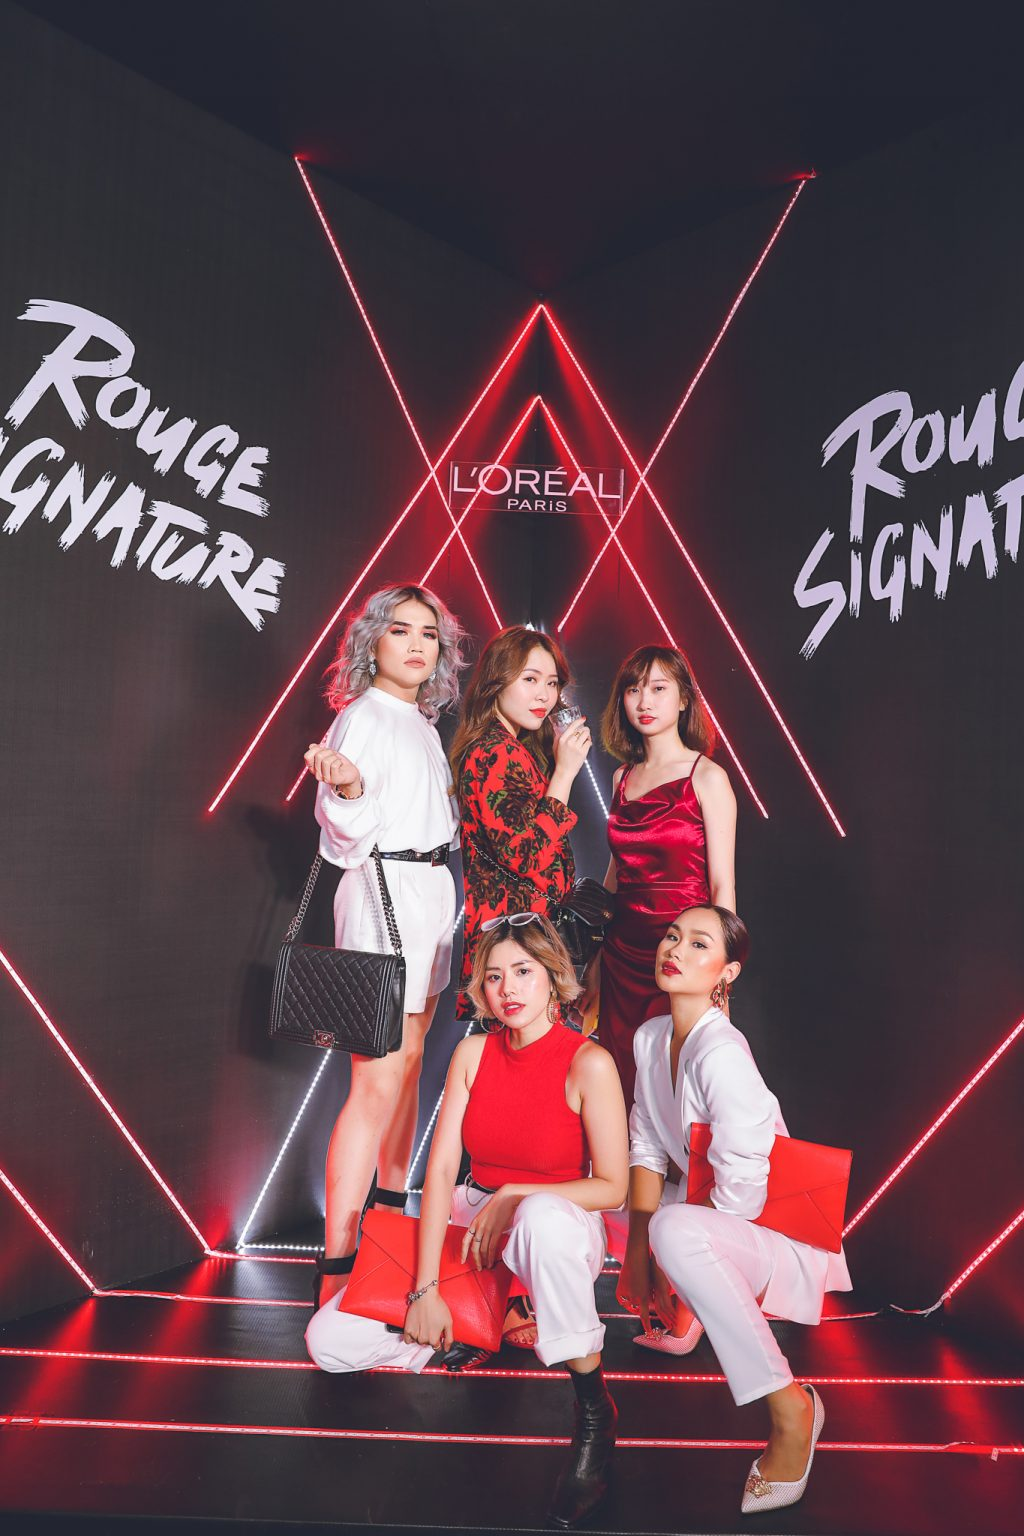 Rouge Signature x Keidi Nails 7